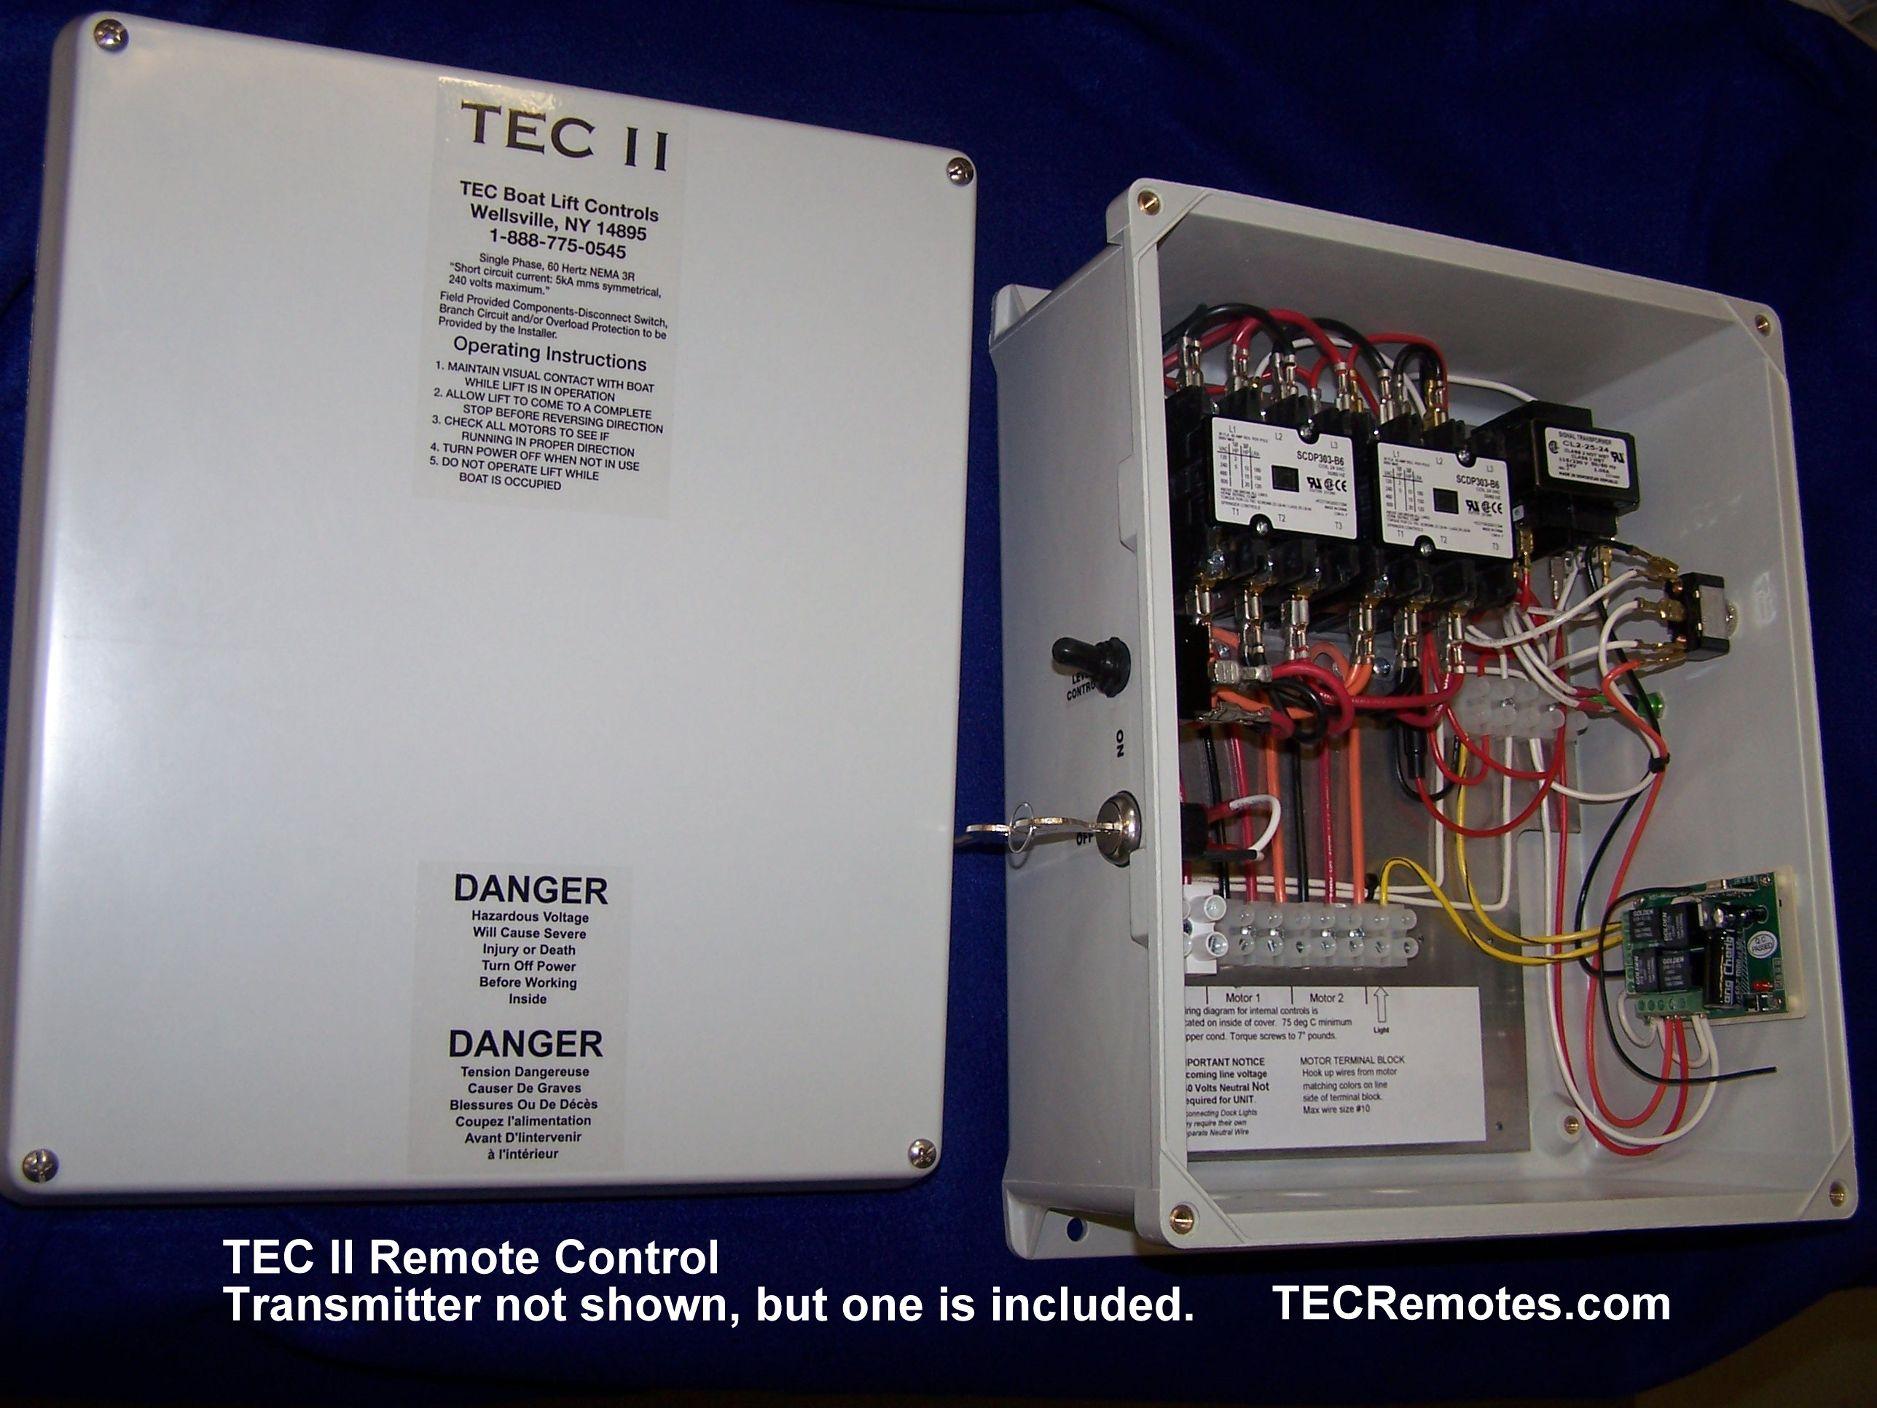 leeson motor wiring diagram meyer snow plow headlight boat lft remote controls, tec i, ii, 1-2, and iv